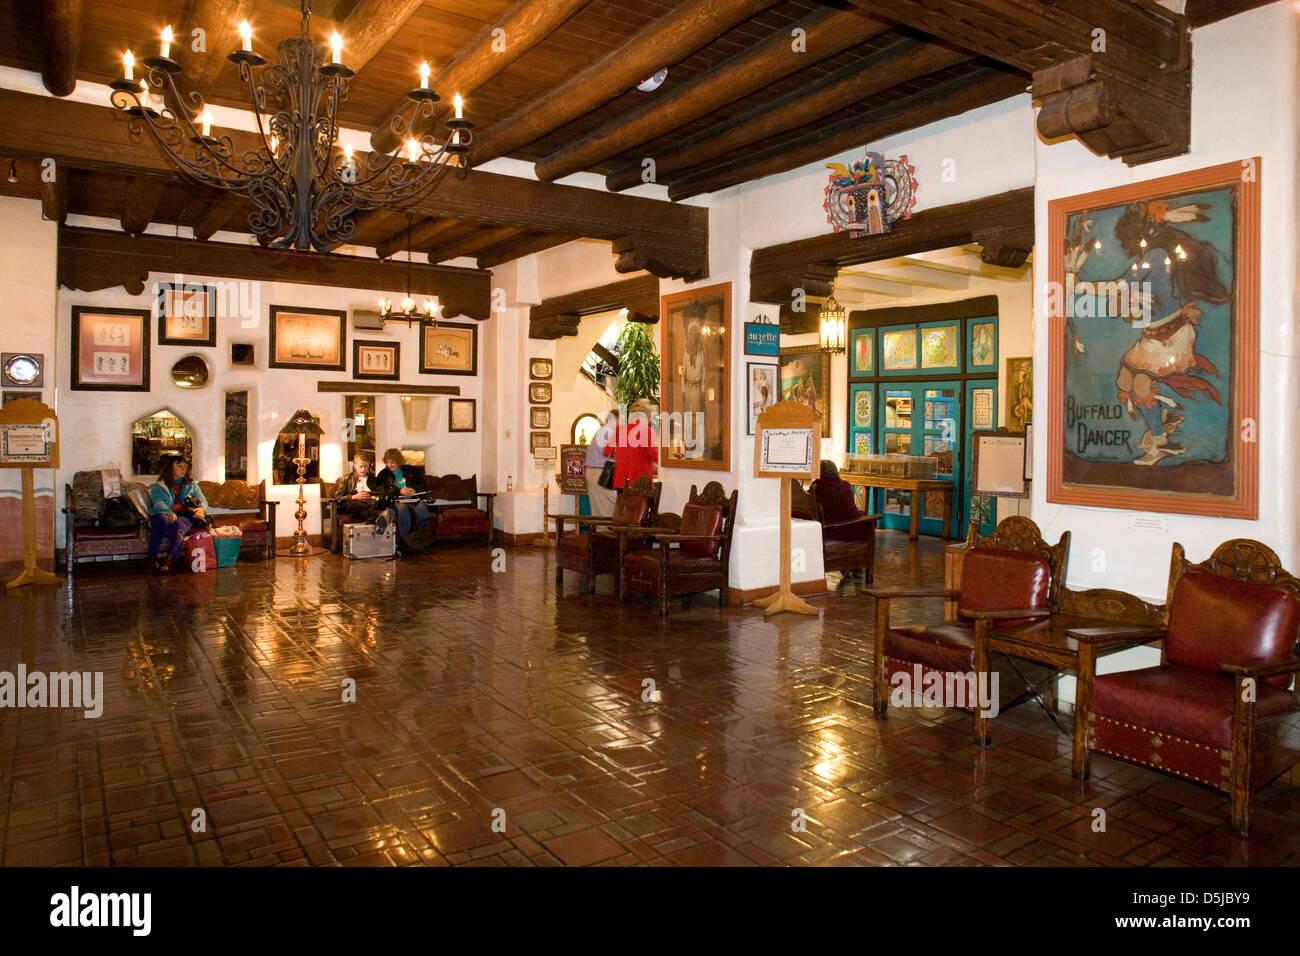 La Fonda Hotel Santa Fe History